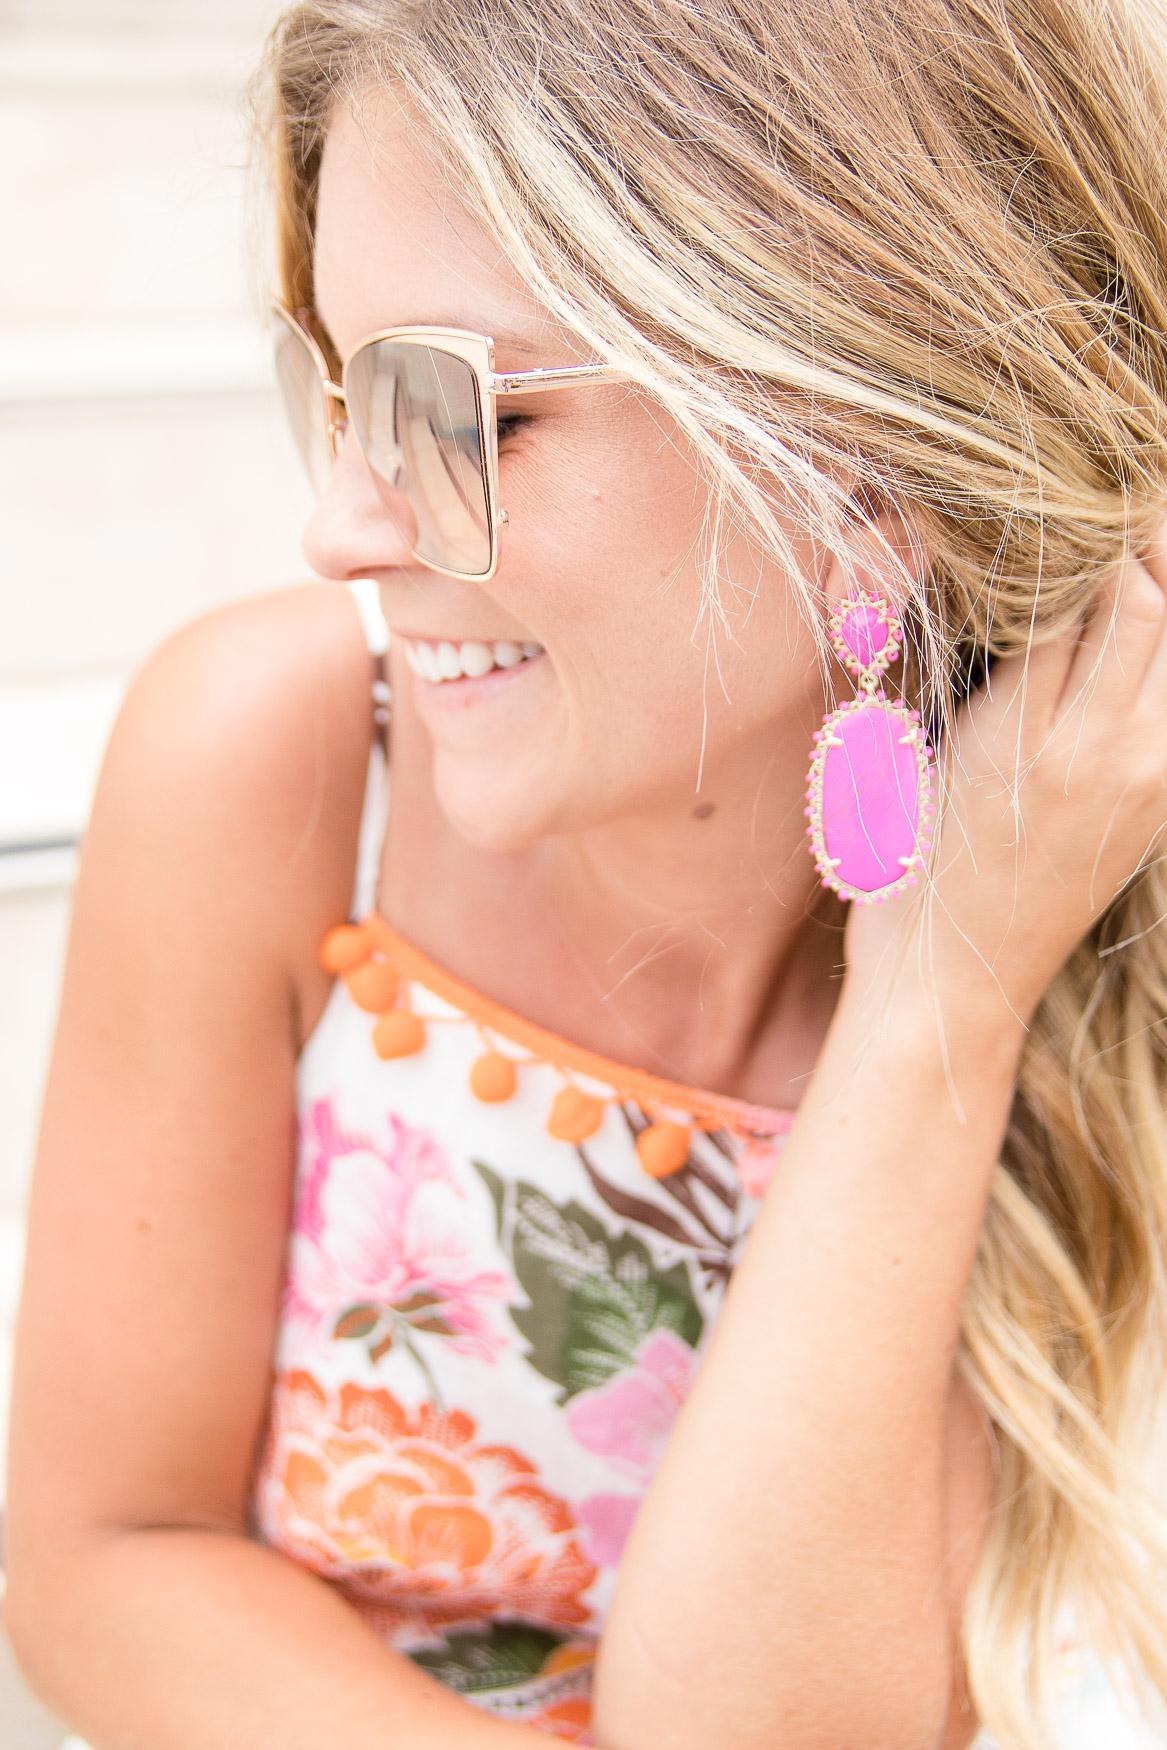 diff sunglasses Kendra Scott pink earrings